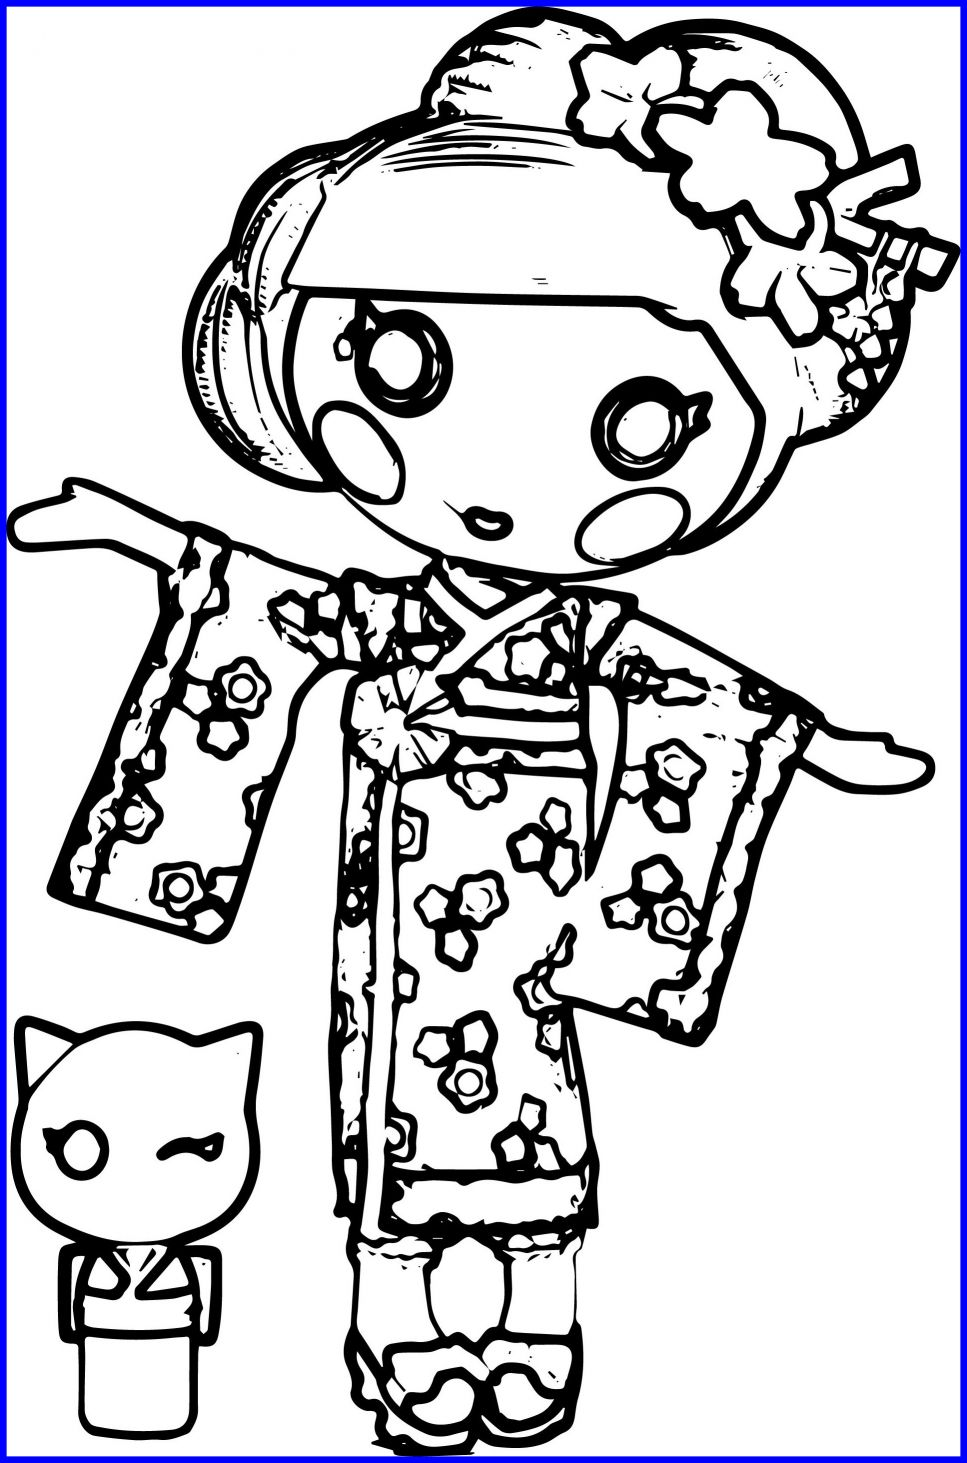 967x1463 Printable Lalaloopsy Coloring Pages